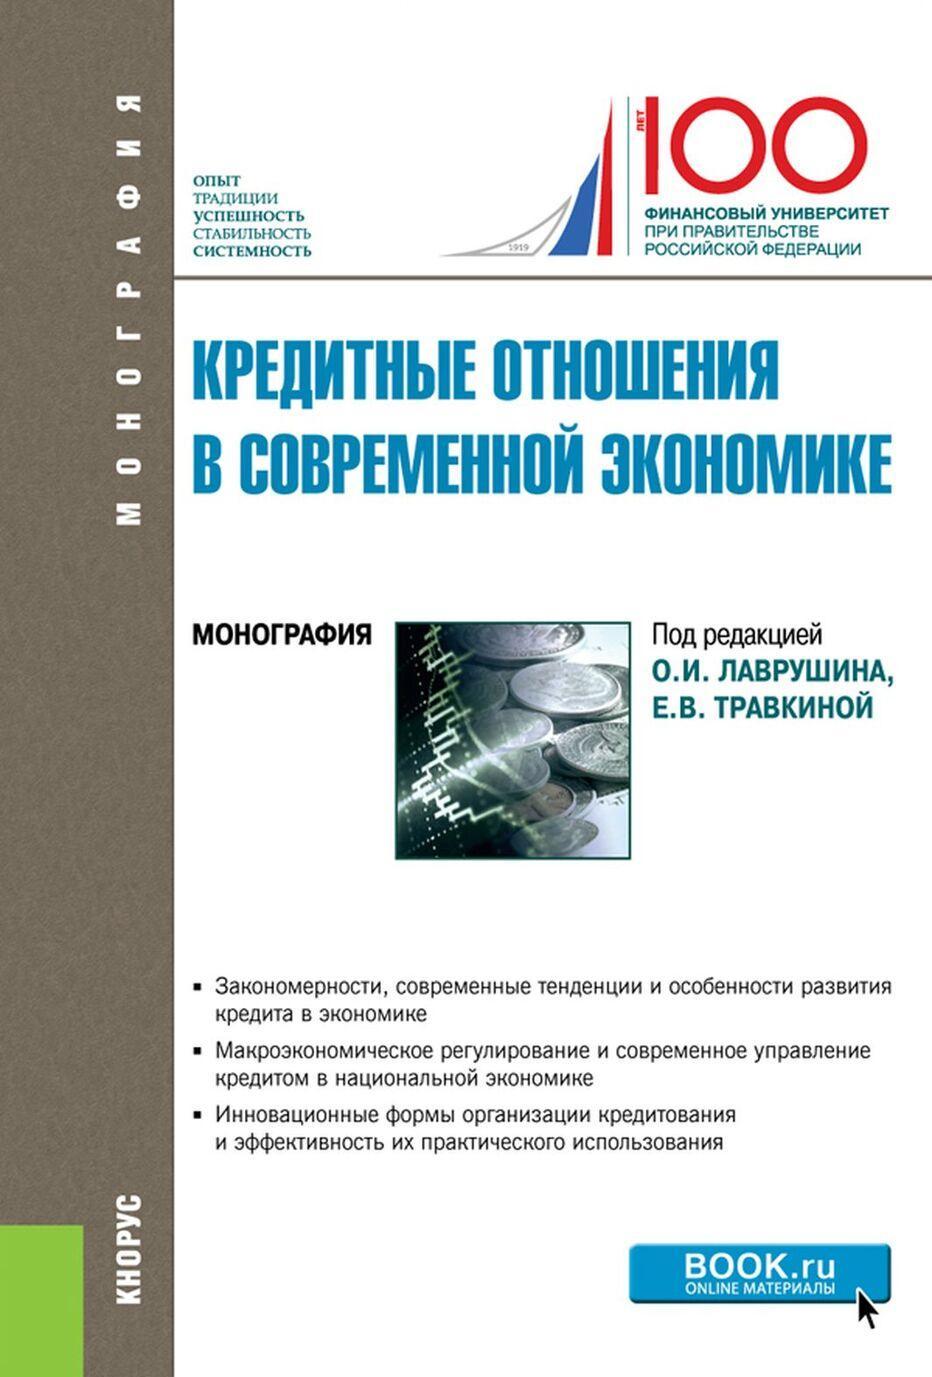 Kreditnye otnoshenija v sovremennoj ekonomika. Monografija | Lavrushin Oleg Ivanovich, Travkina E. V.